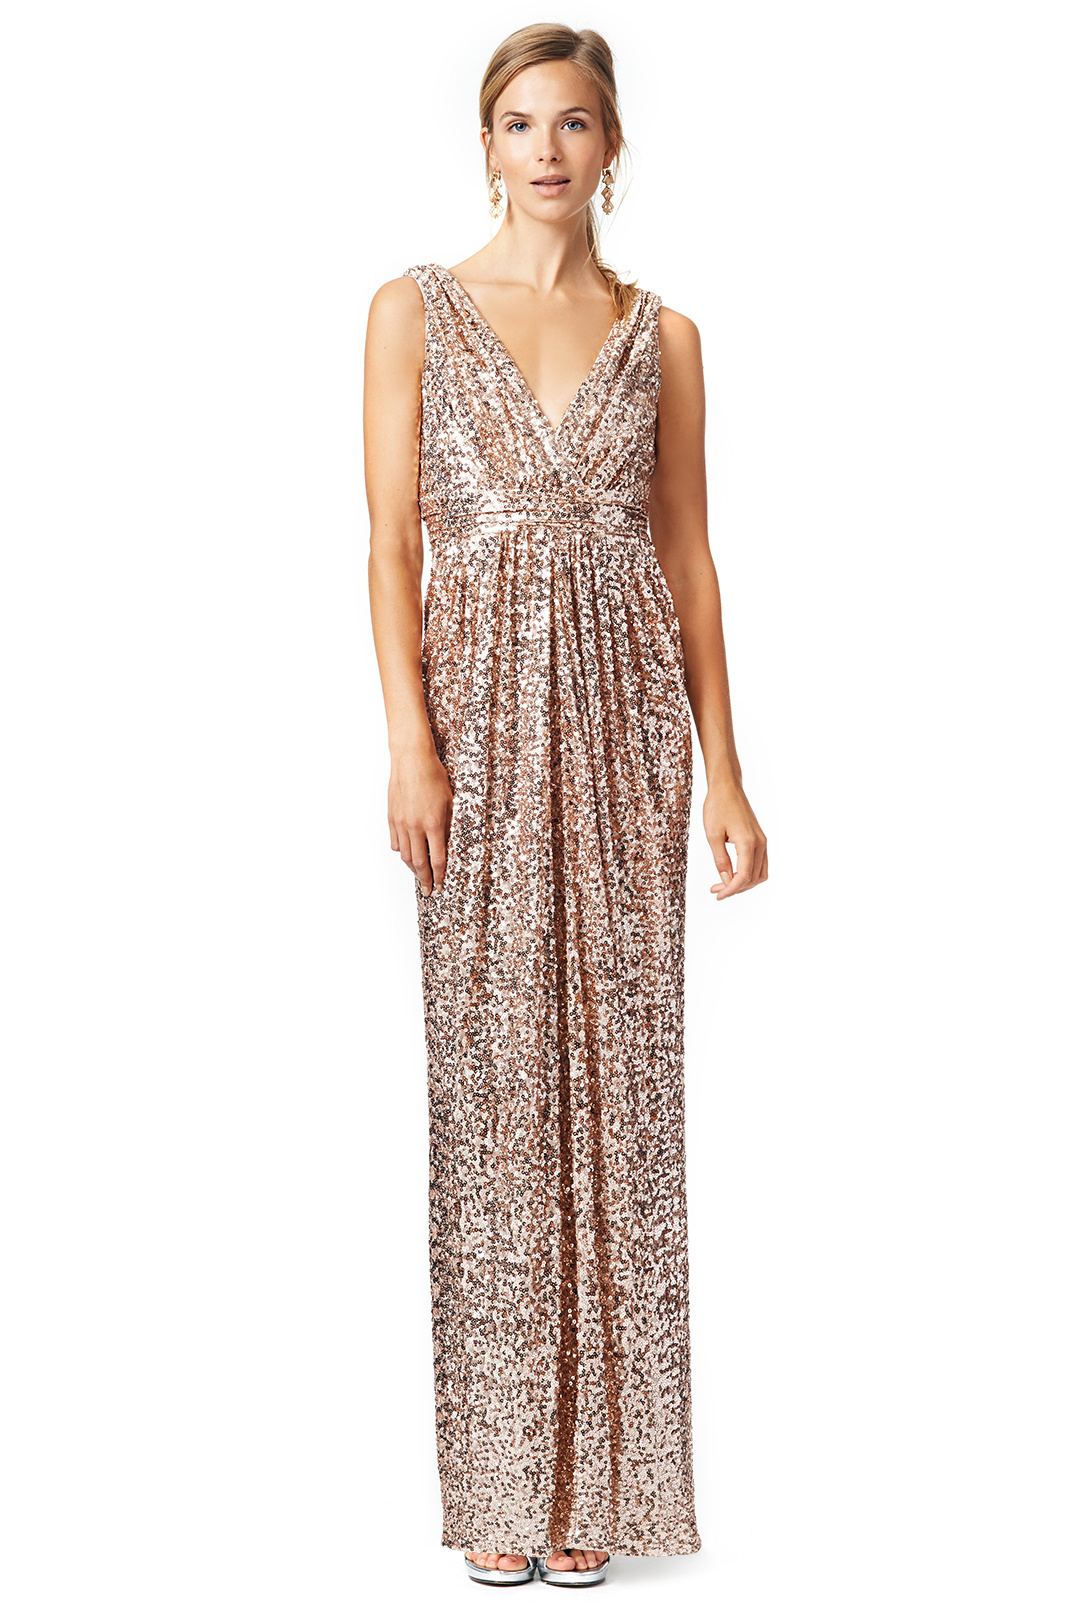 Rent the Runway - Badgley Mischka Glitz Gown